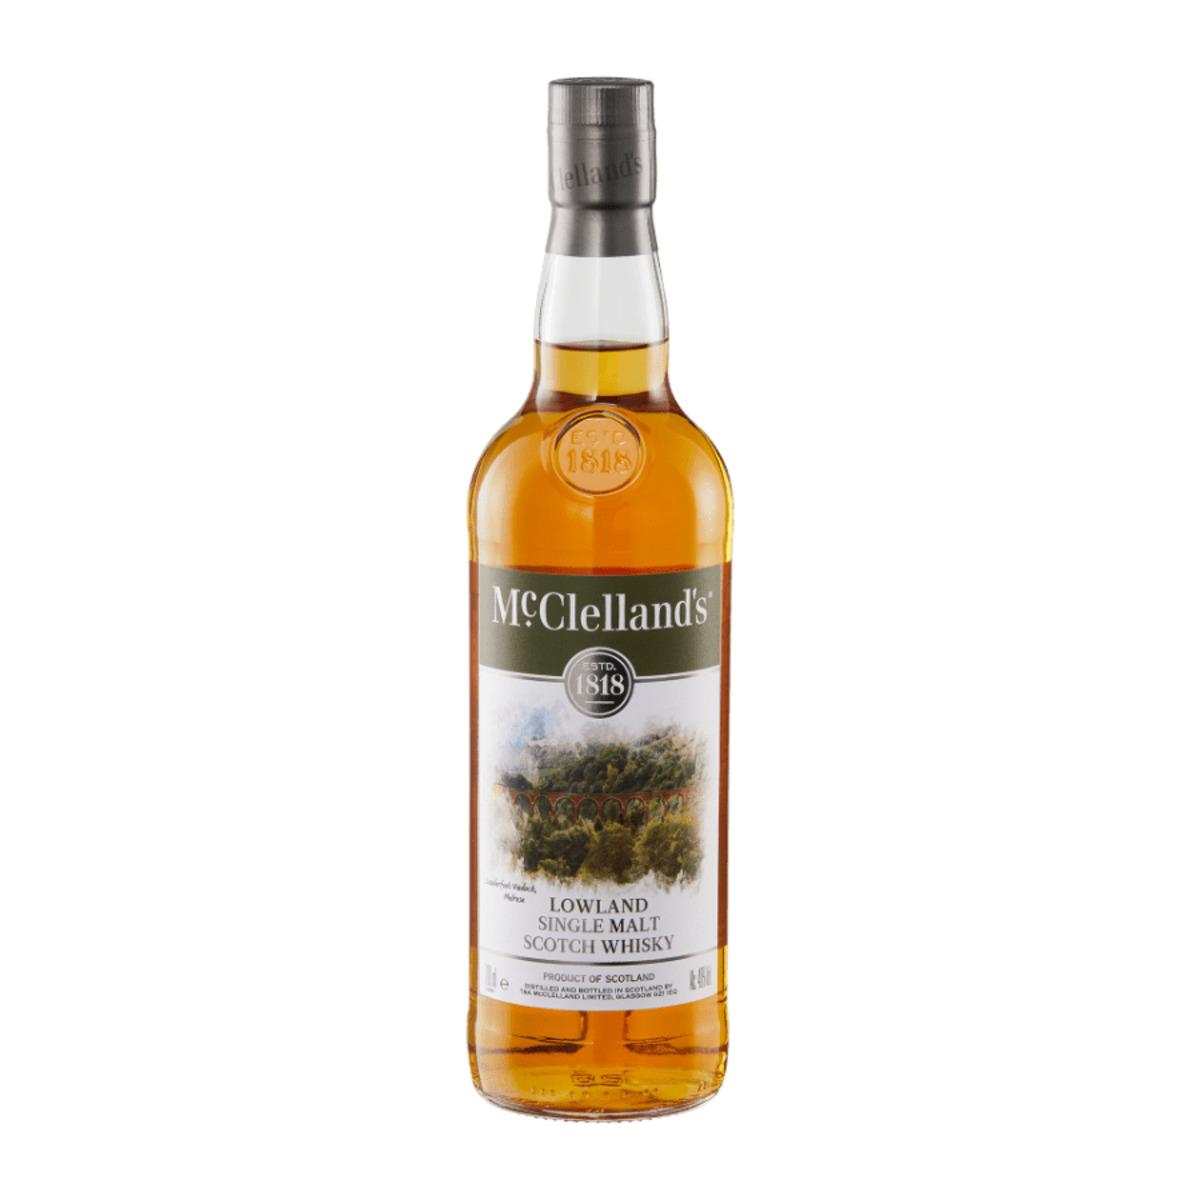 Bild 2 von McClelland's Single Malt Scotch Whisky